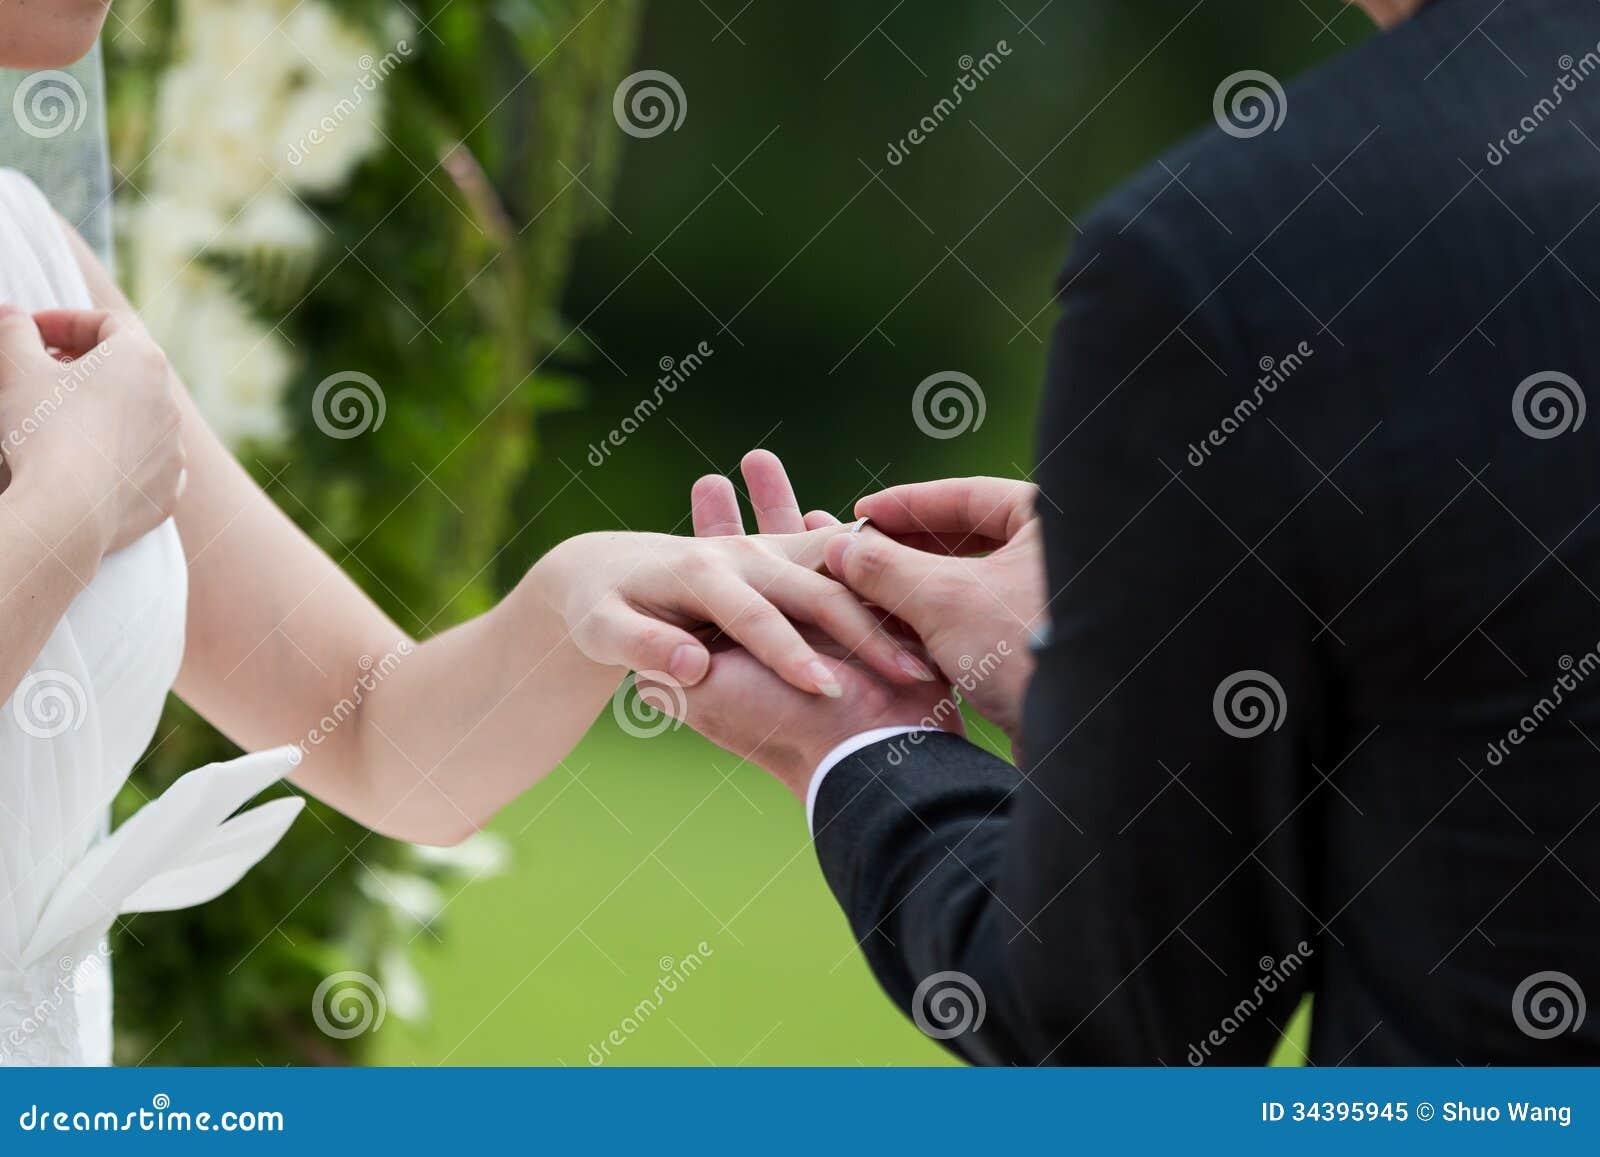 wedding ring royalty free stock photo image 34395945